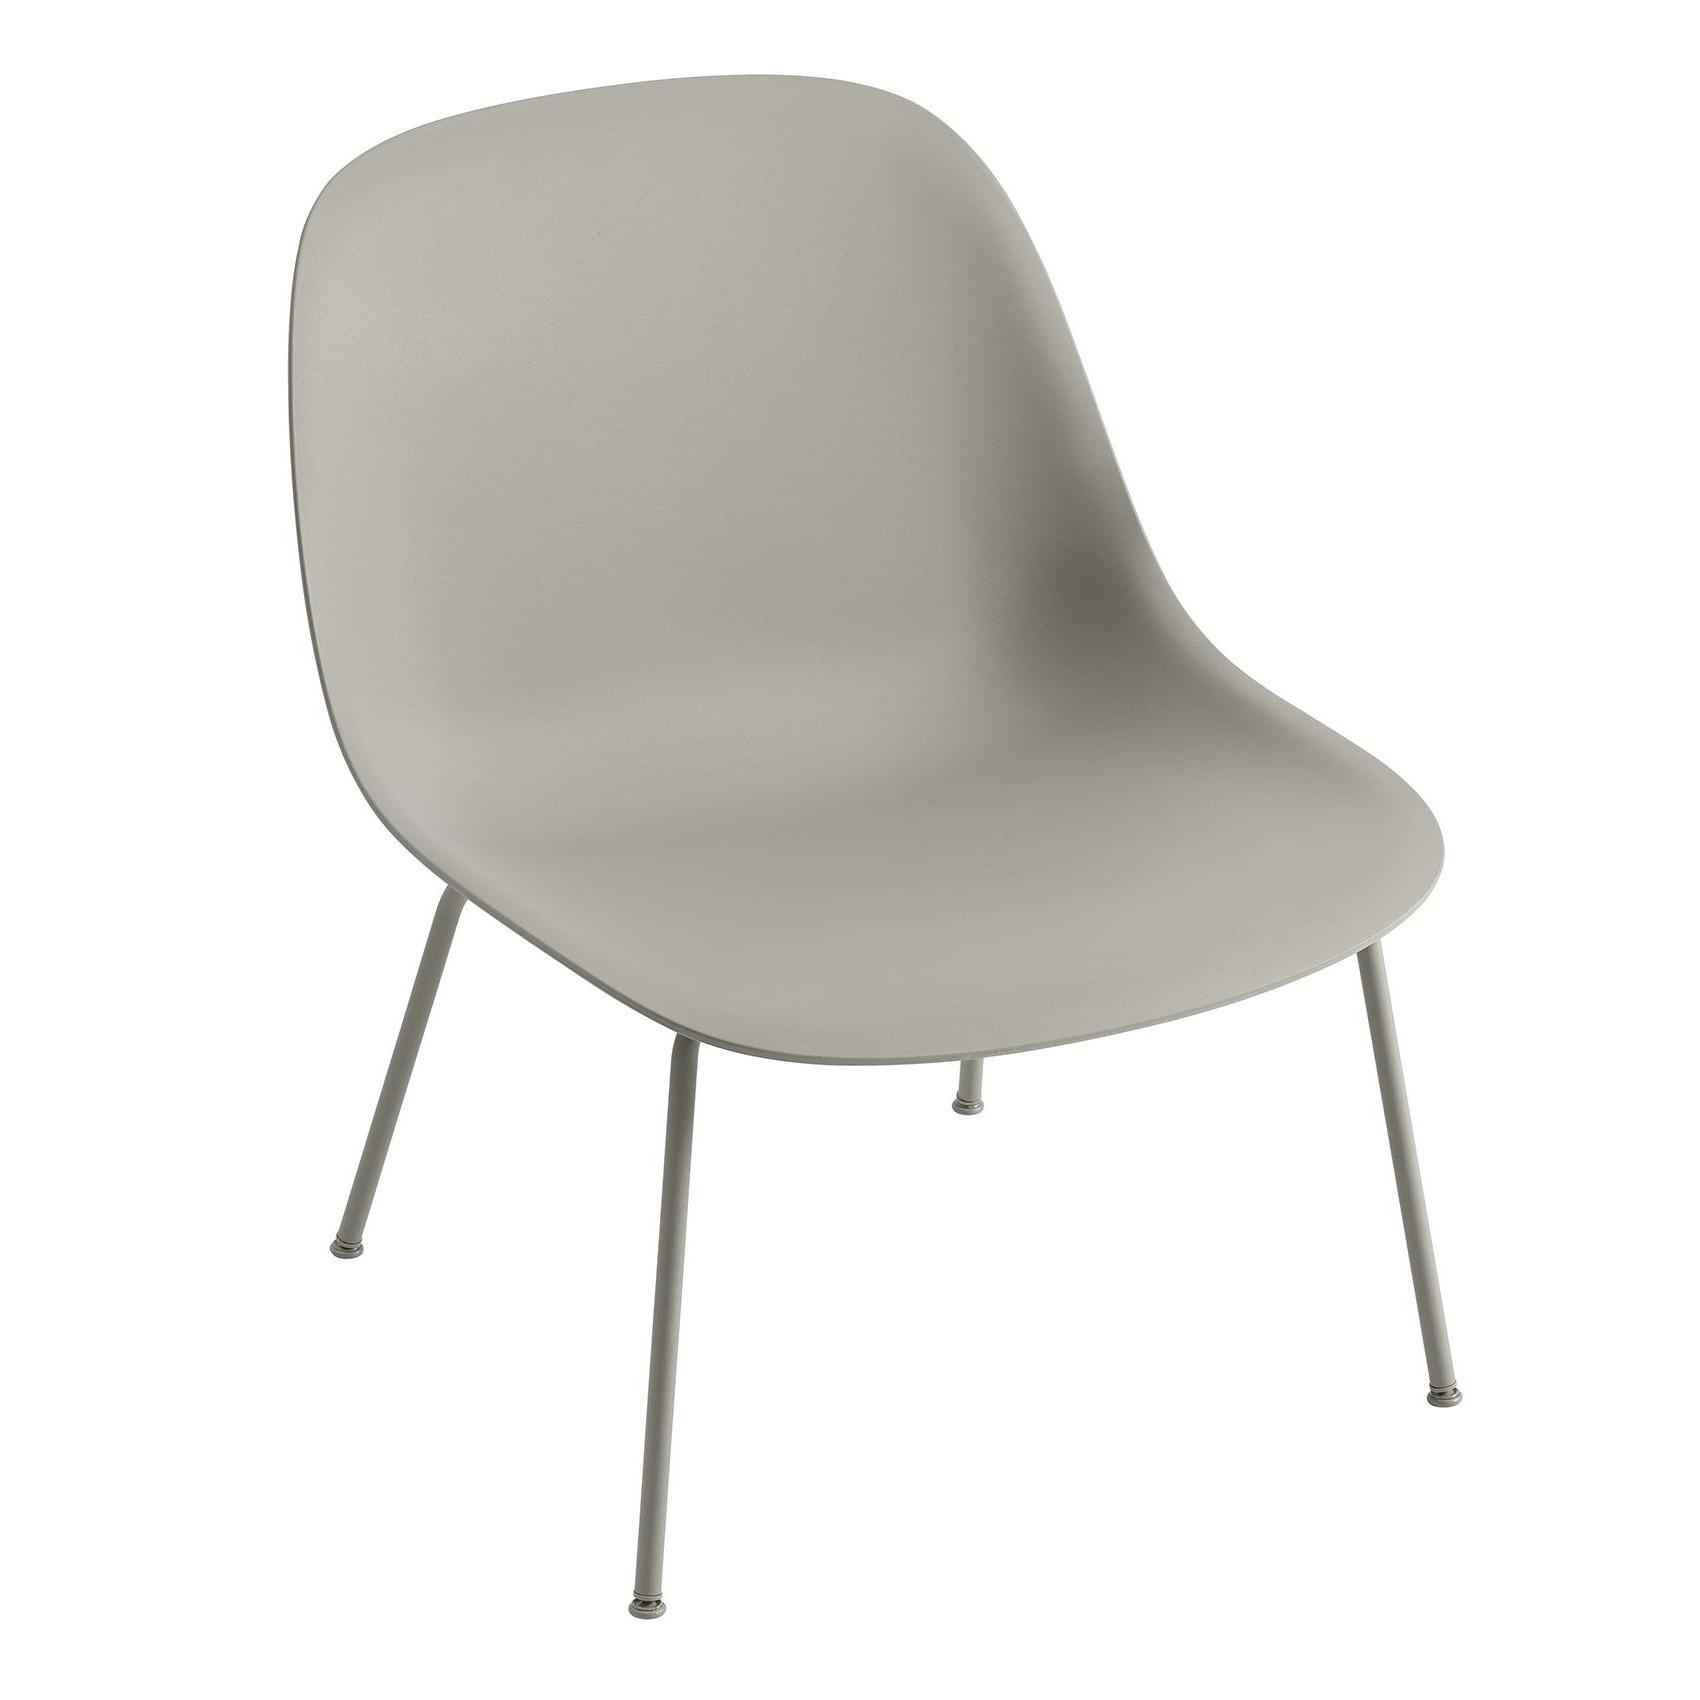 steel lounge chair game of thrones replica muuto fiber base ambientedirect